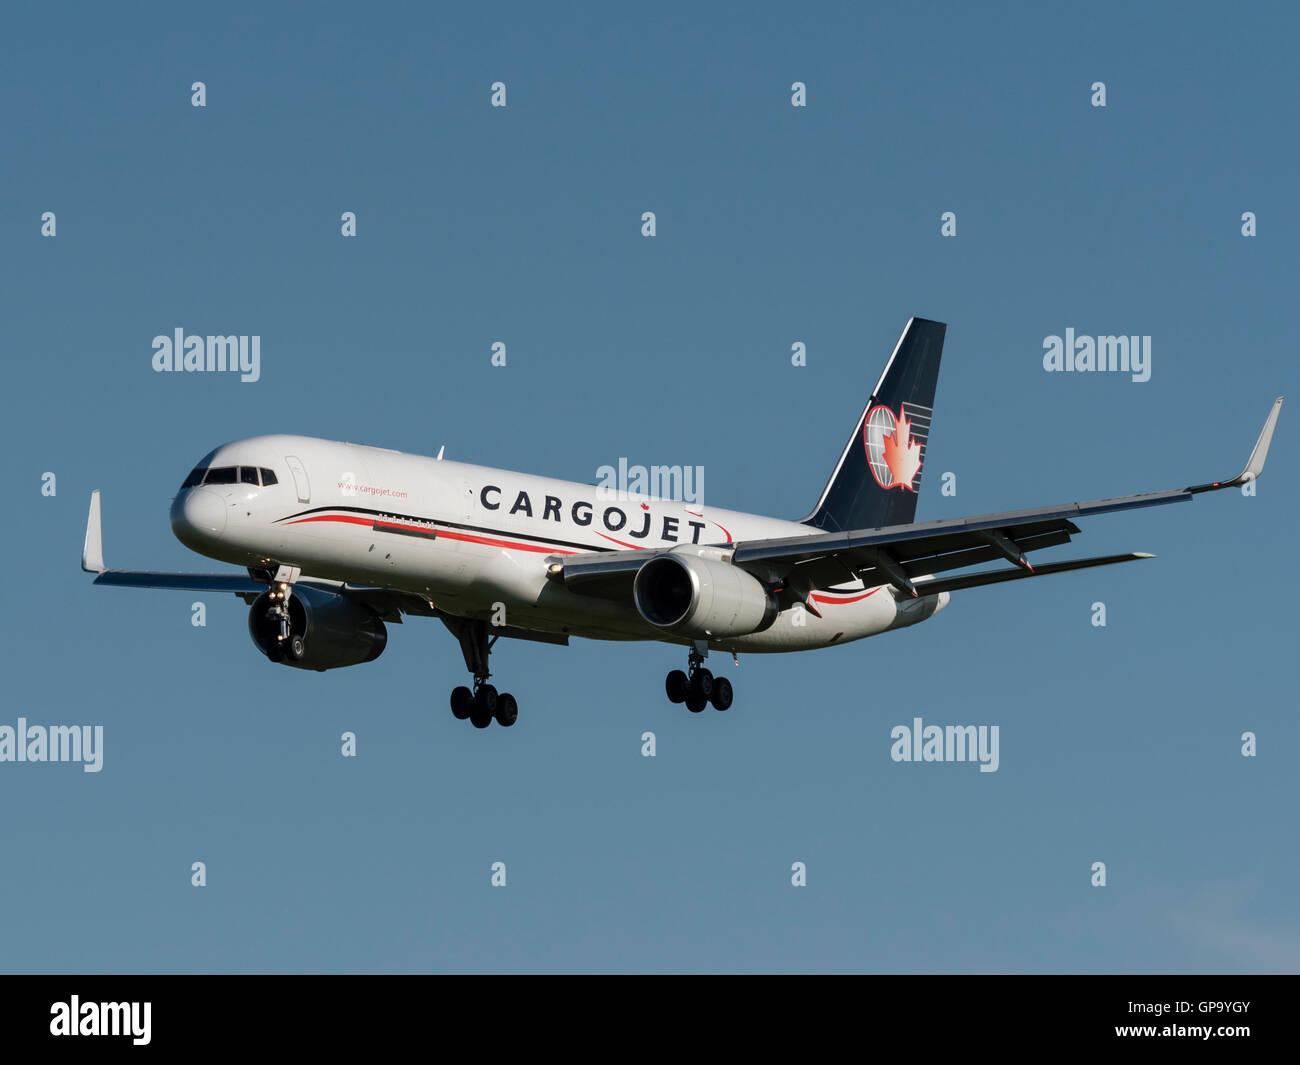 Cargojet Airways Boeing 757 C-FGKJ air cargo freighter final approach for landing Calgary International Airport, - Stock Image